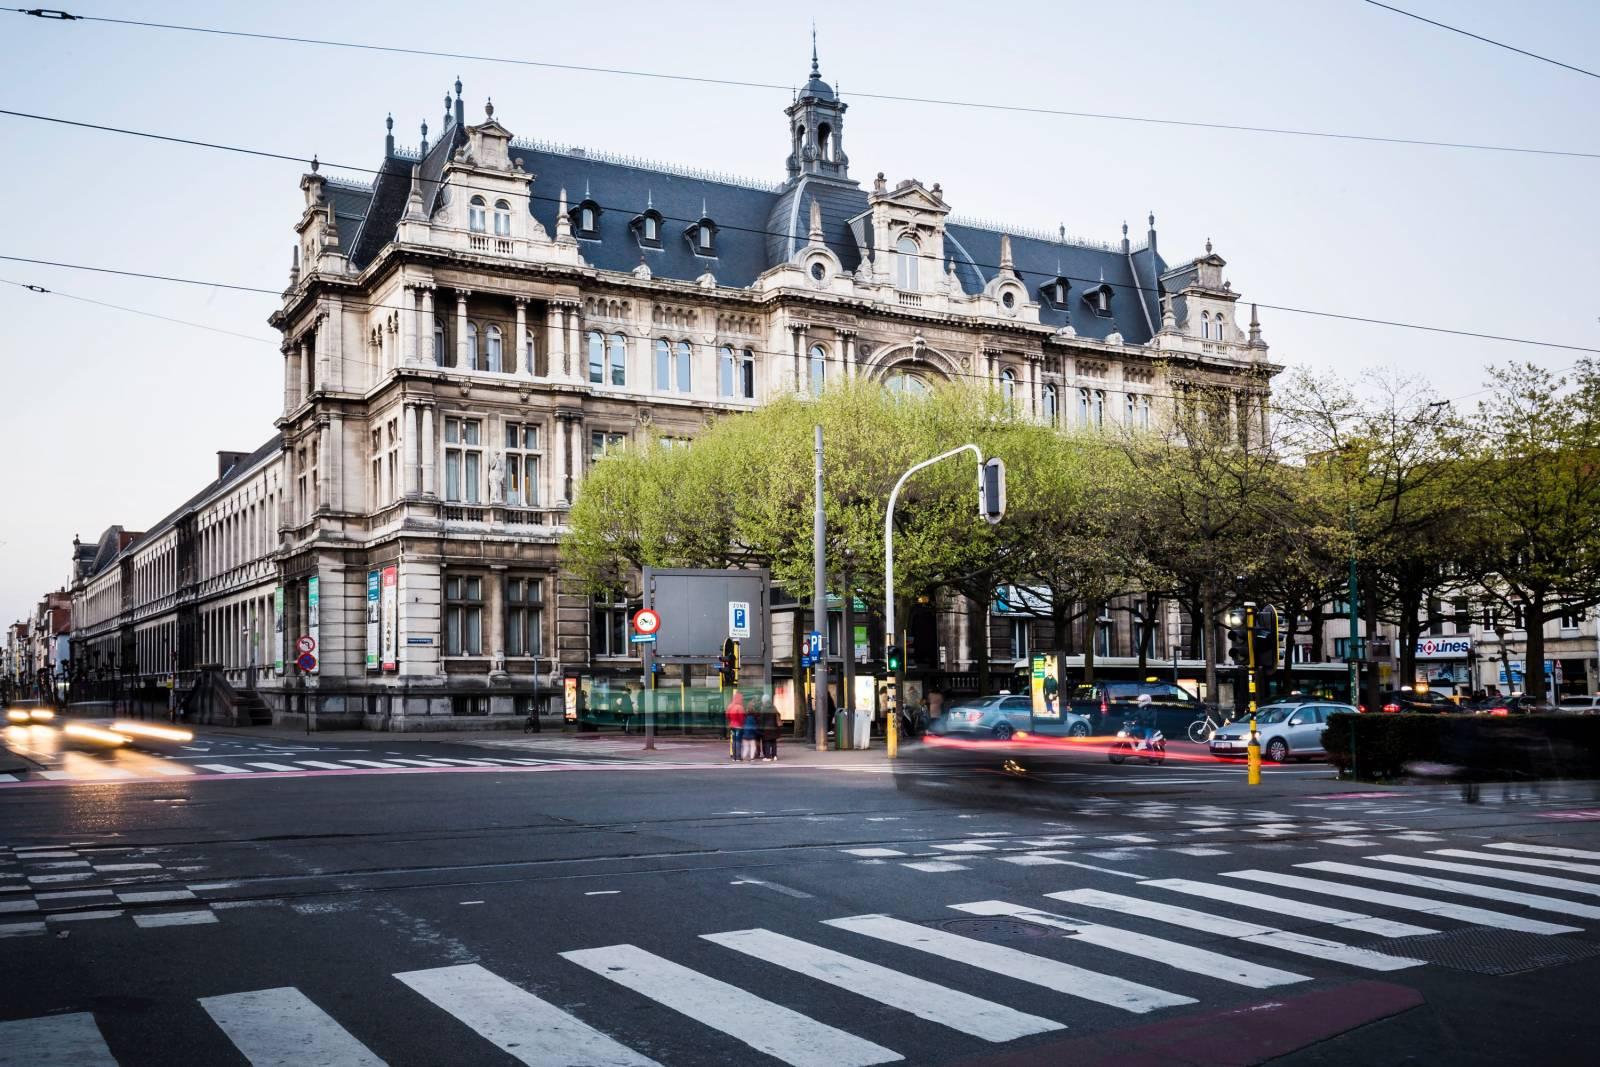 Zaal AthenA - Feestzaal - Trouwzaal - Antwerpen - House of Weddings - 1